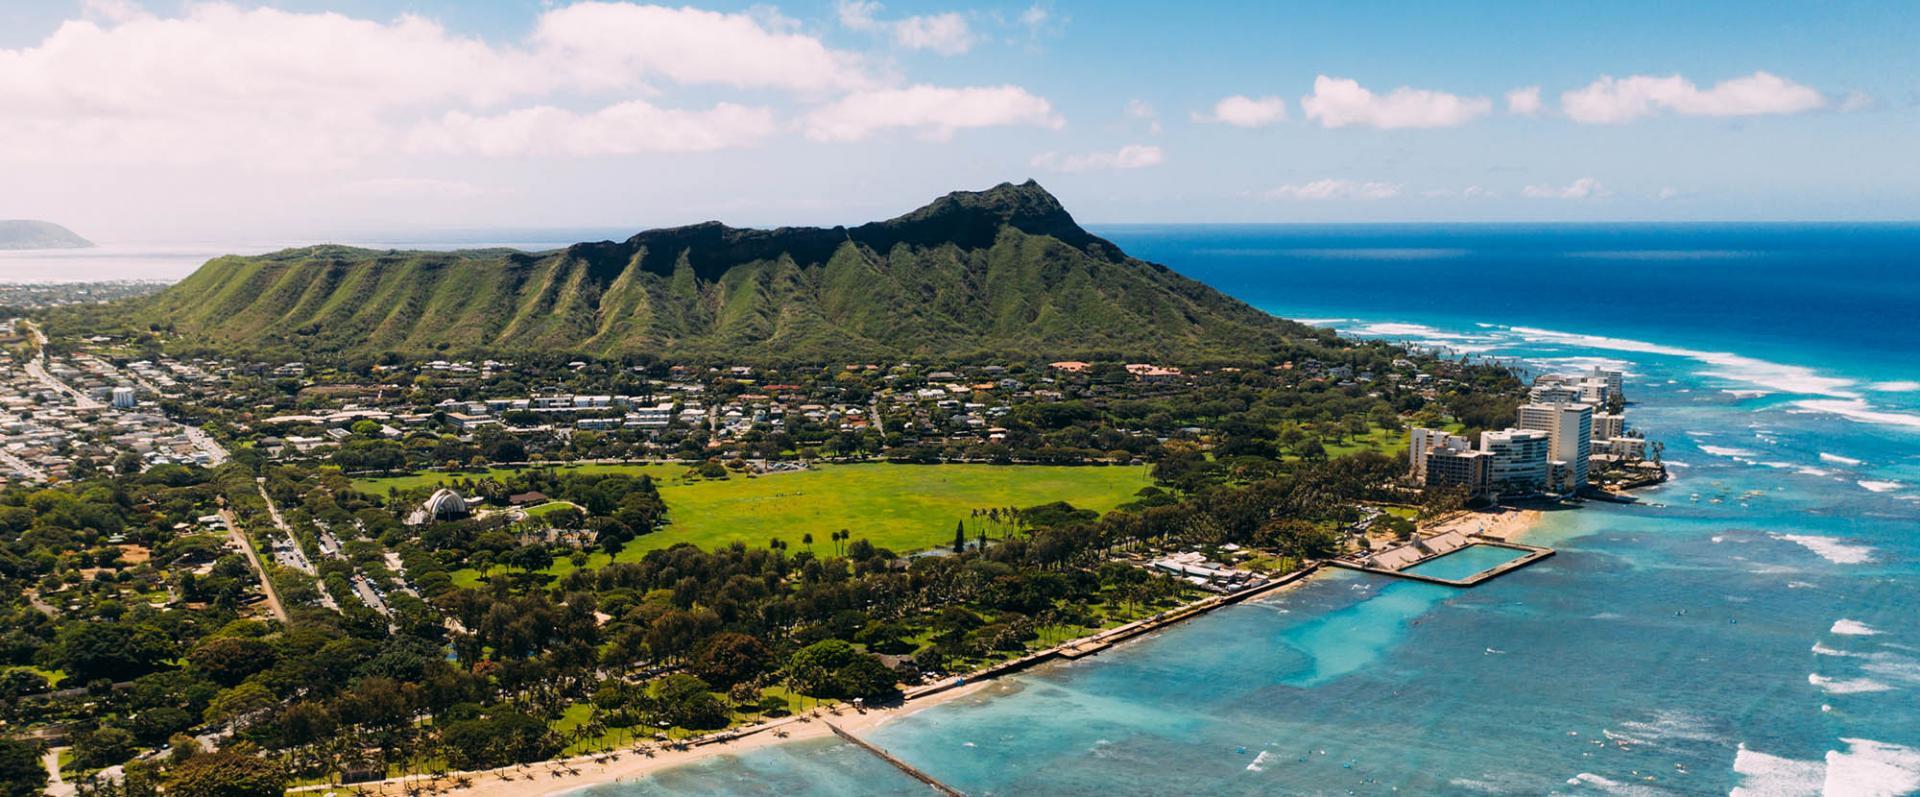 Scenic view of Diamond Head Oahu island